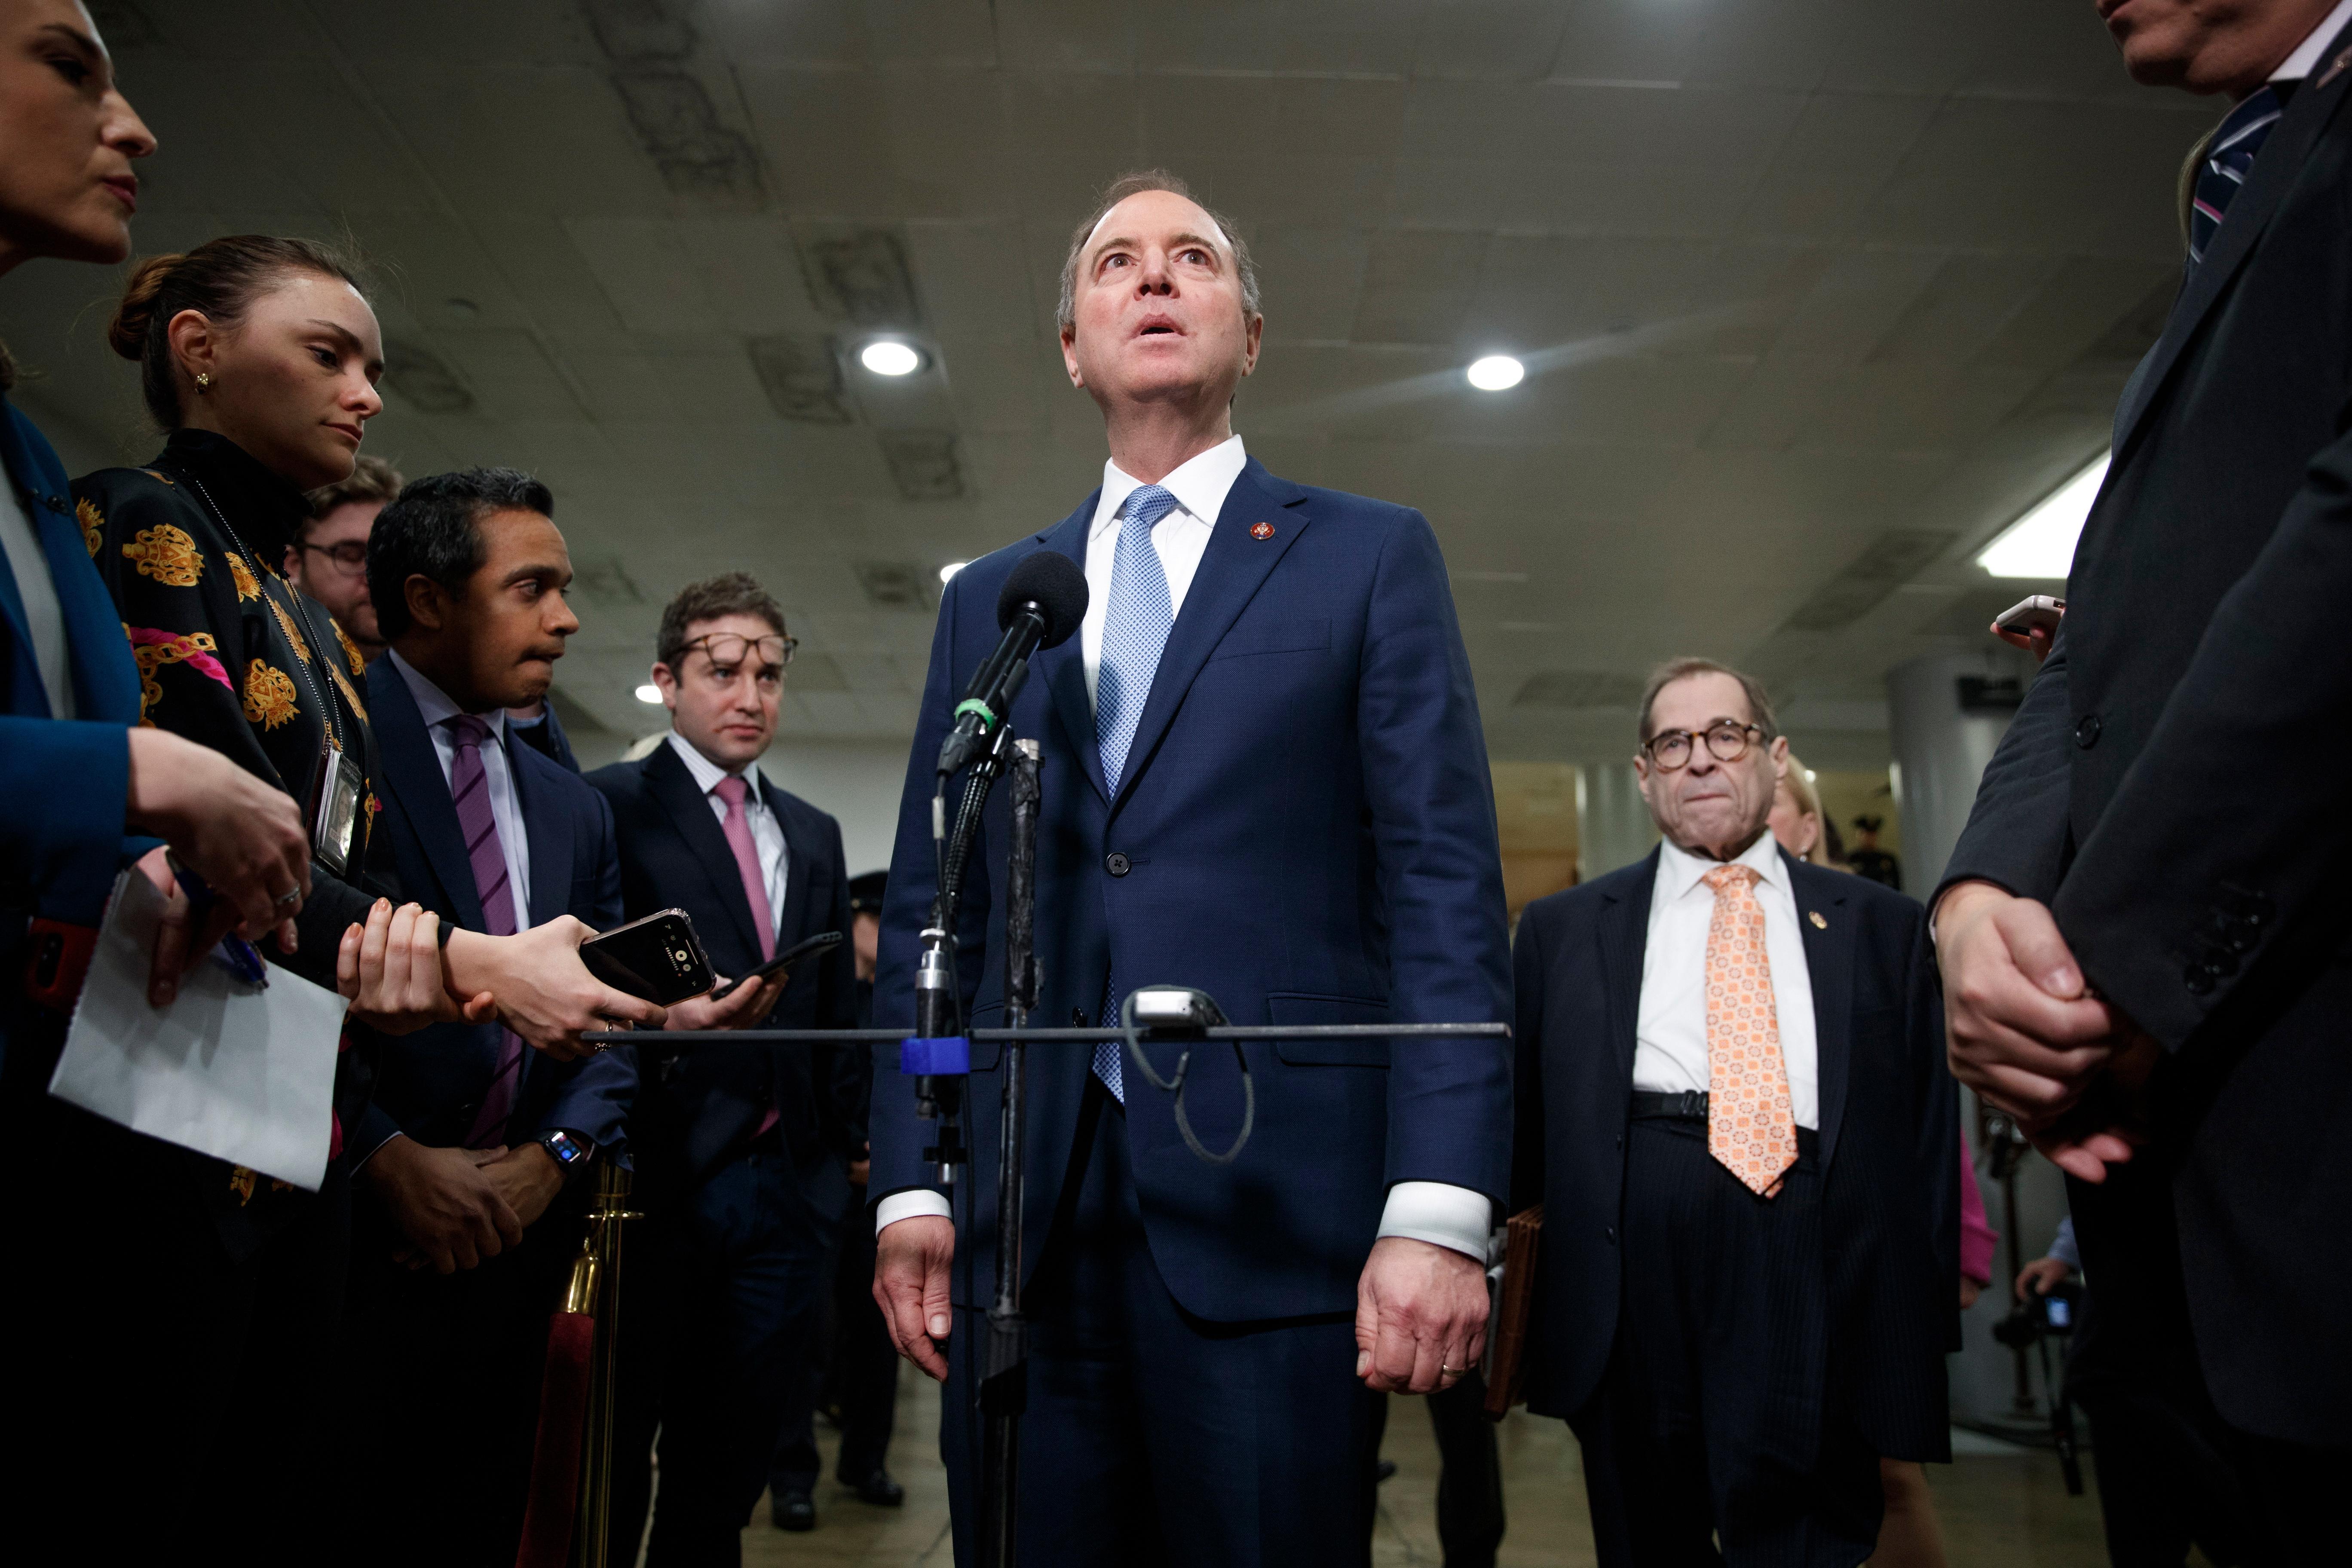 Democrats focus on Ukraine 'cover-up' as marathon impeachment case wraps